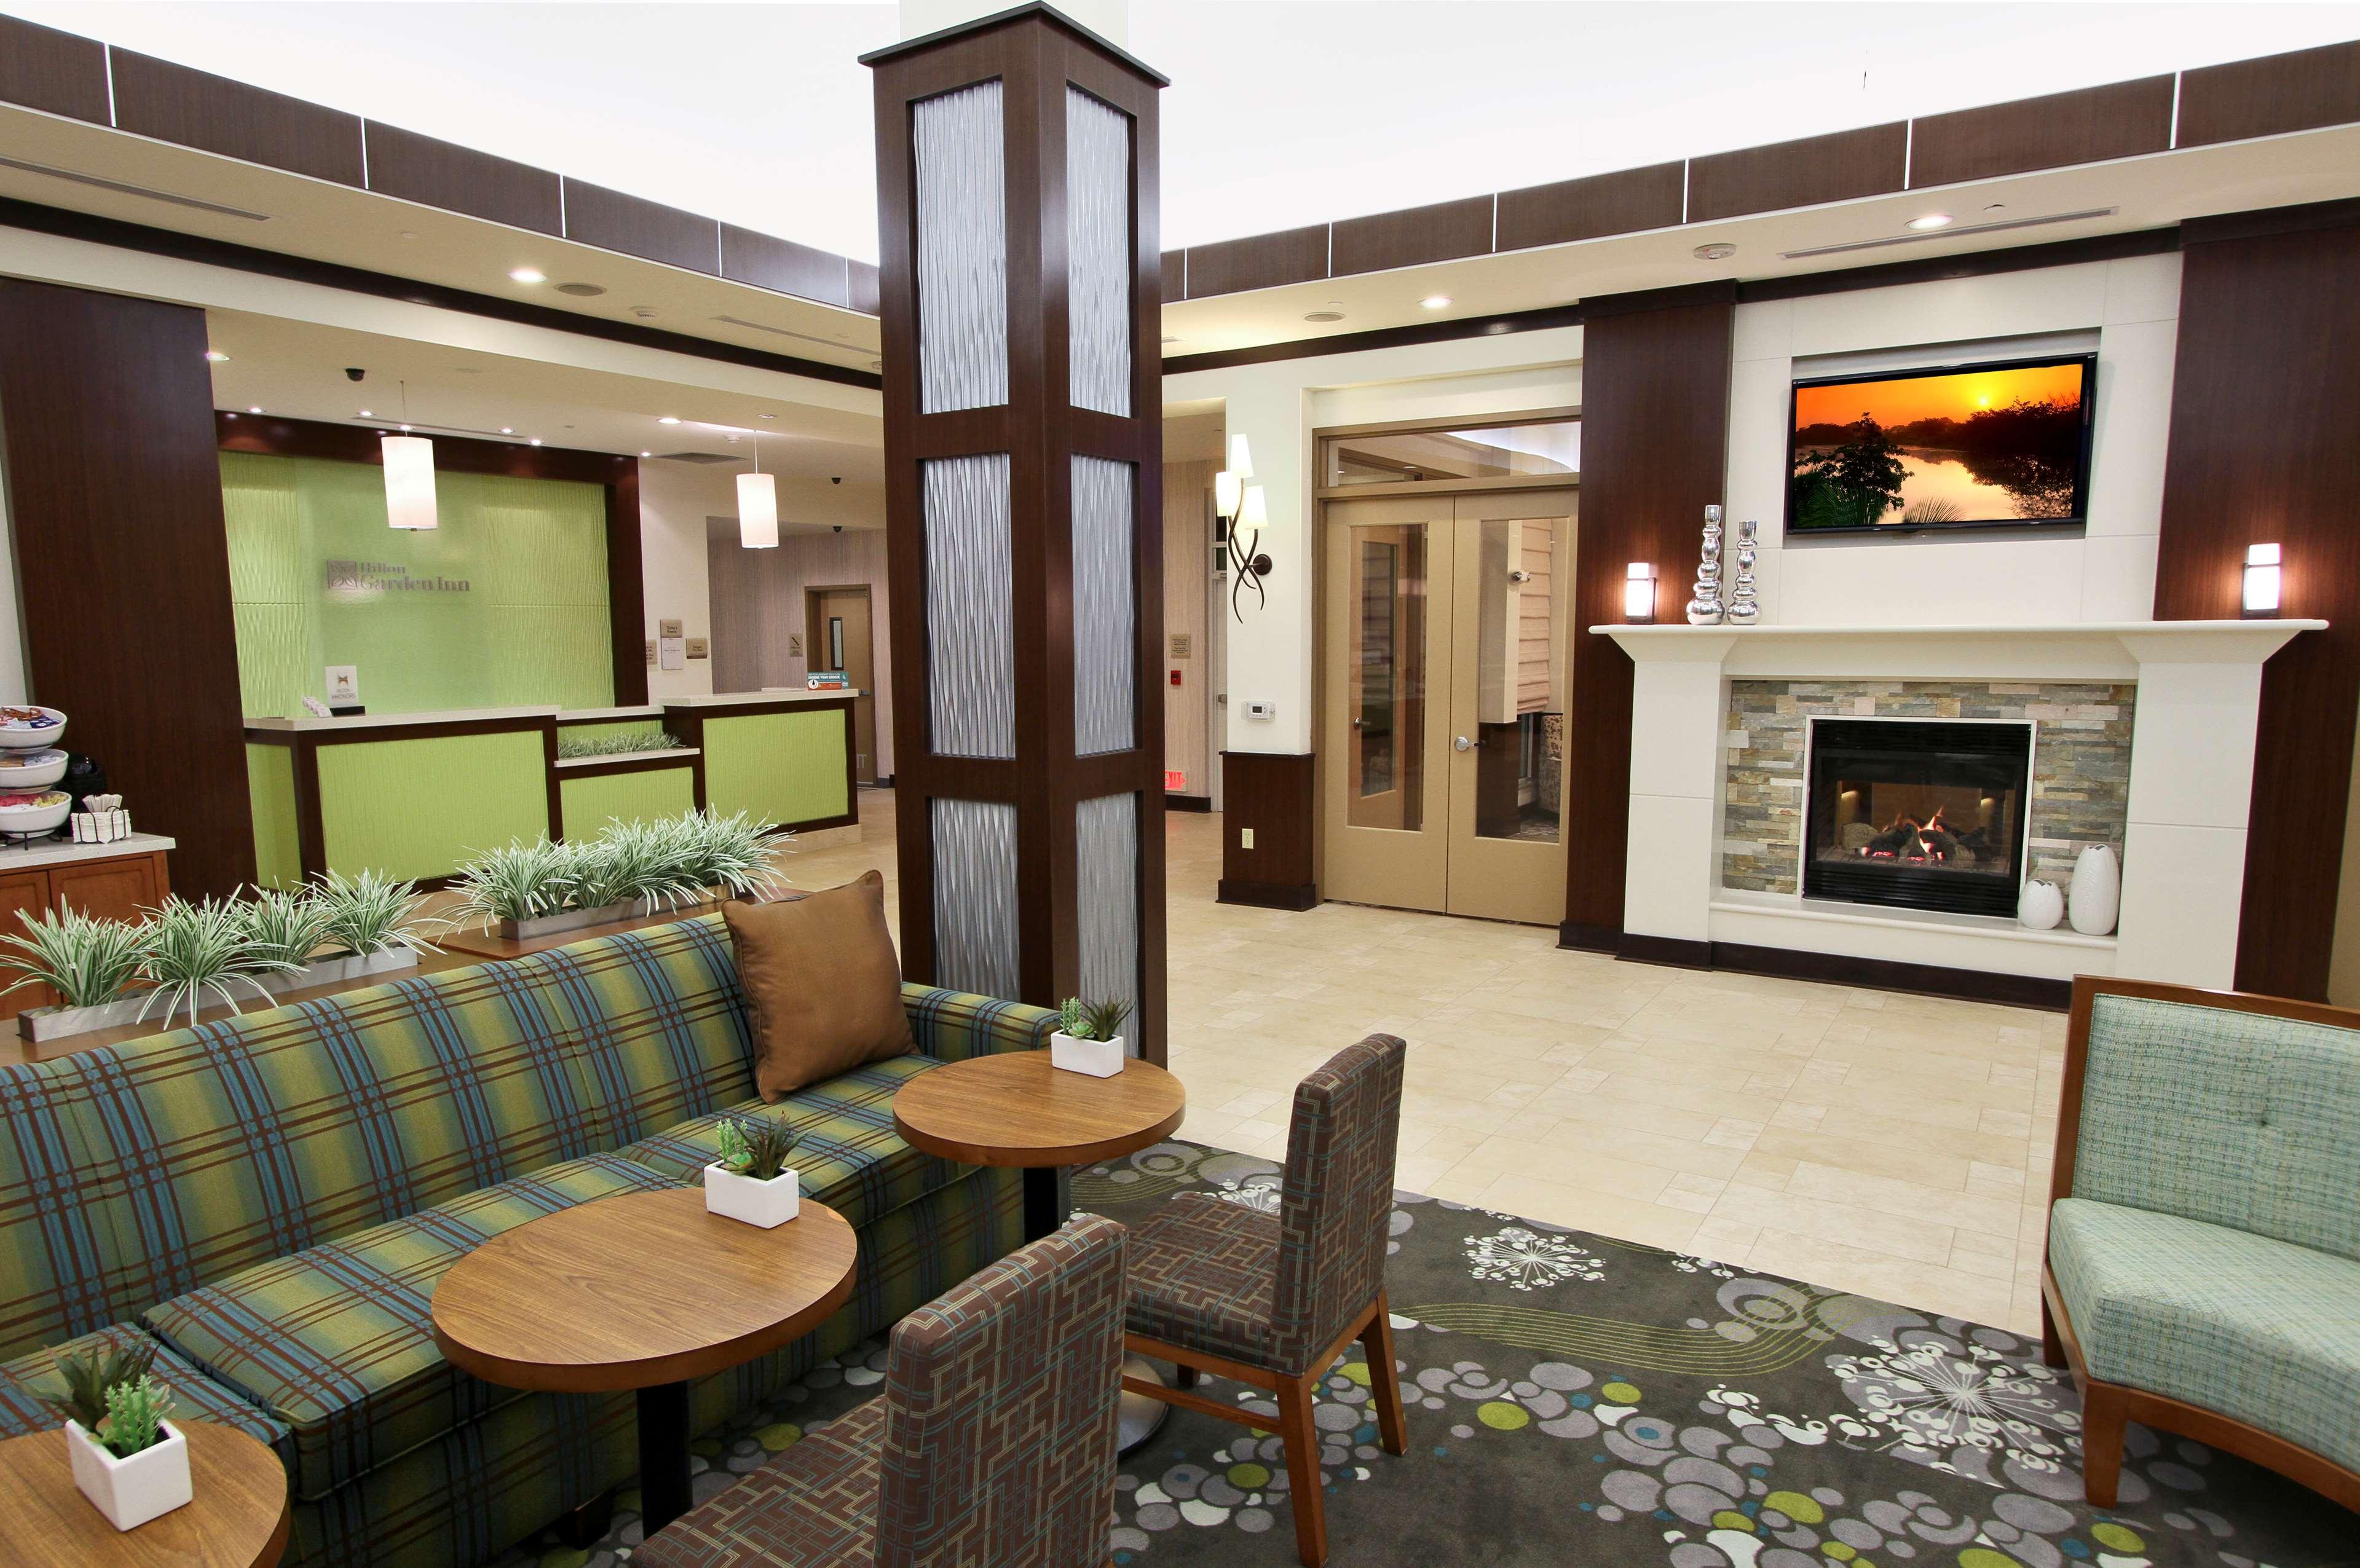 Hilton Garden Inn Covington/Mandeville image 5